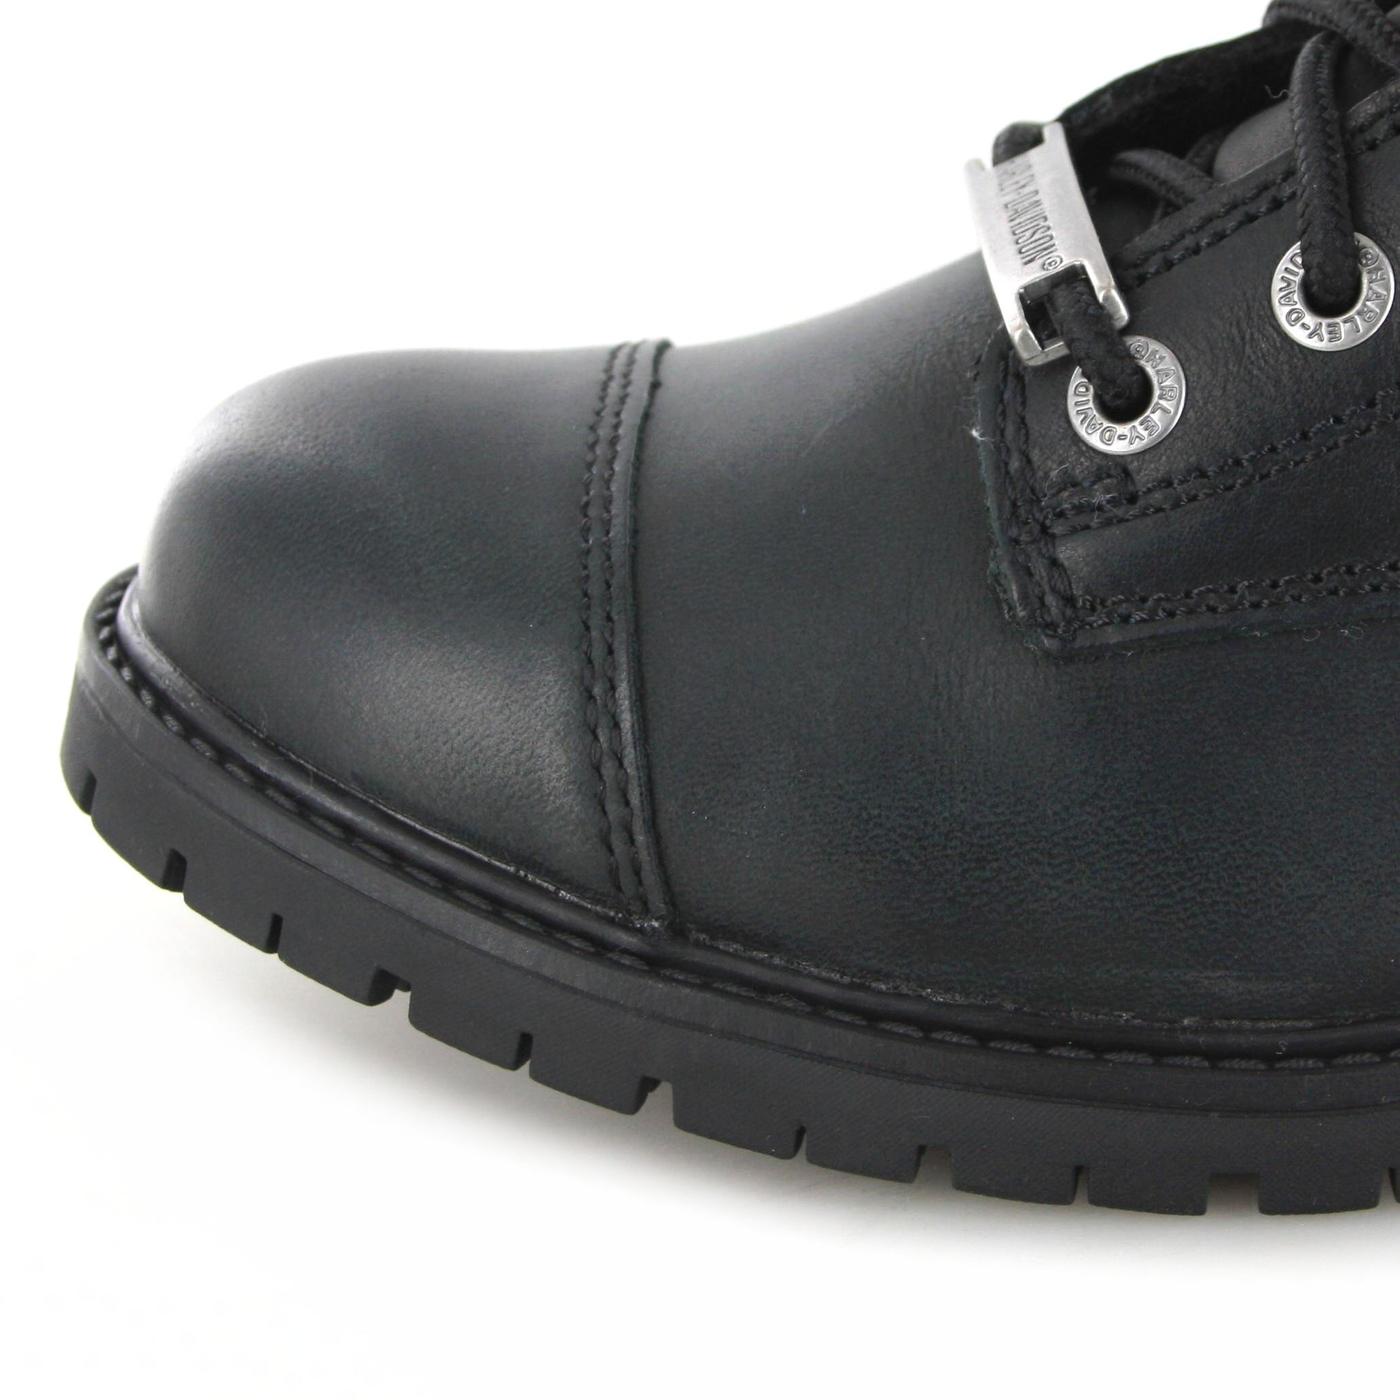 097d8b534fa4 Harley-Davidson D93461 BOWERS Black Lace-up boots - Black – Bild 2